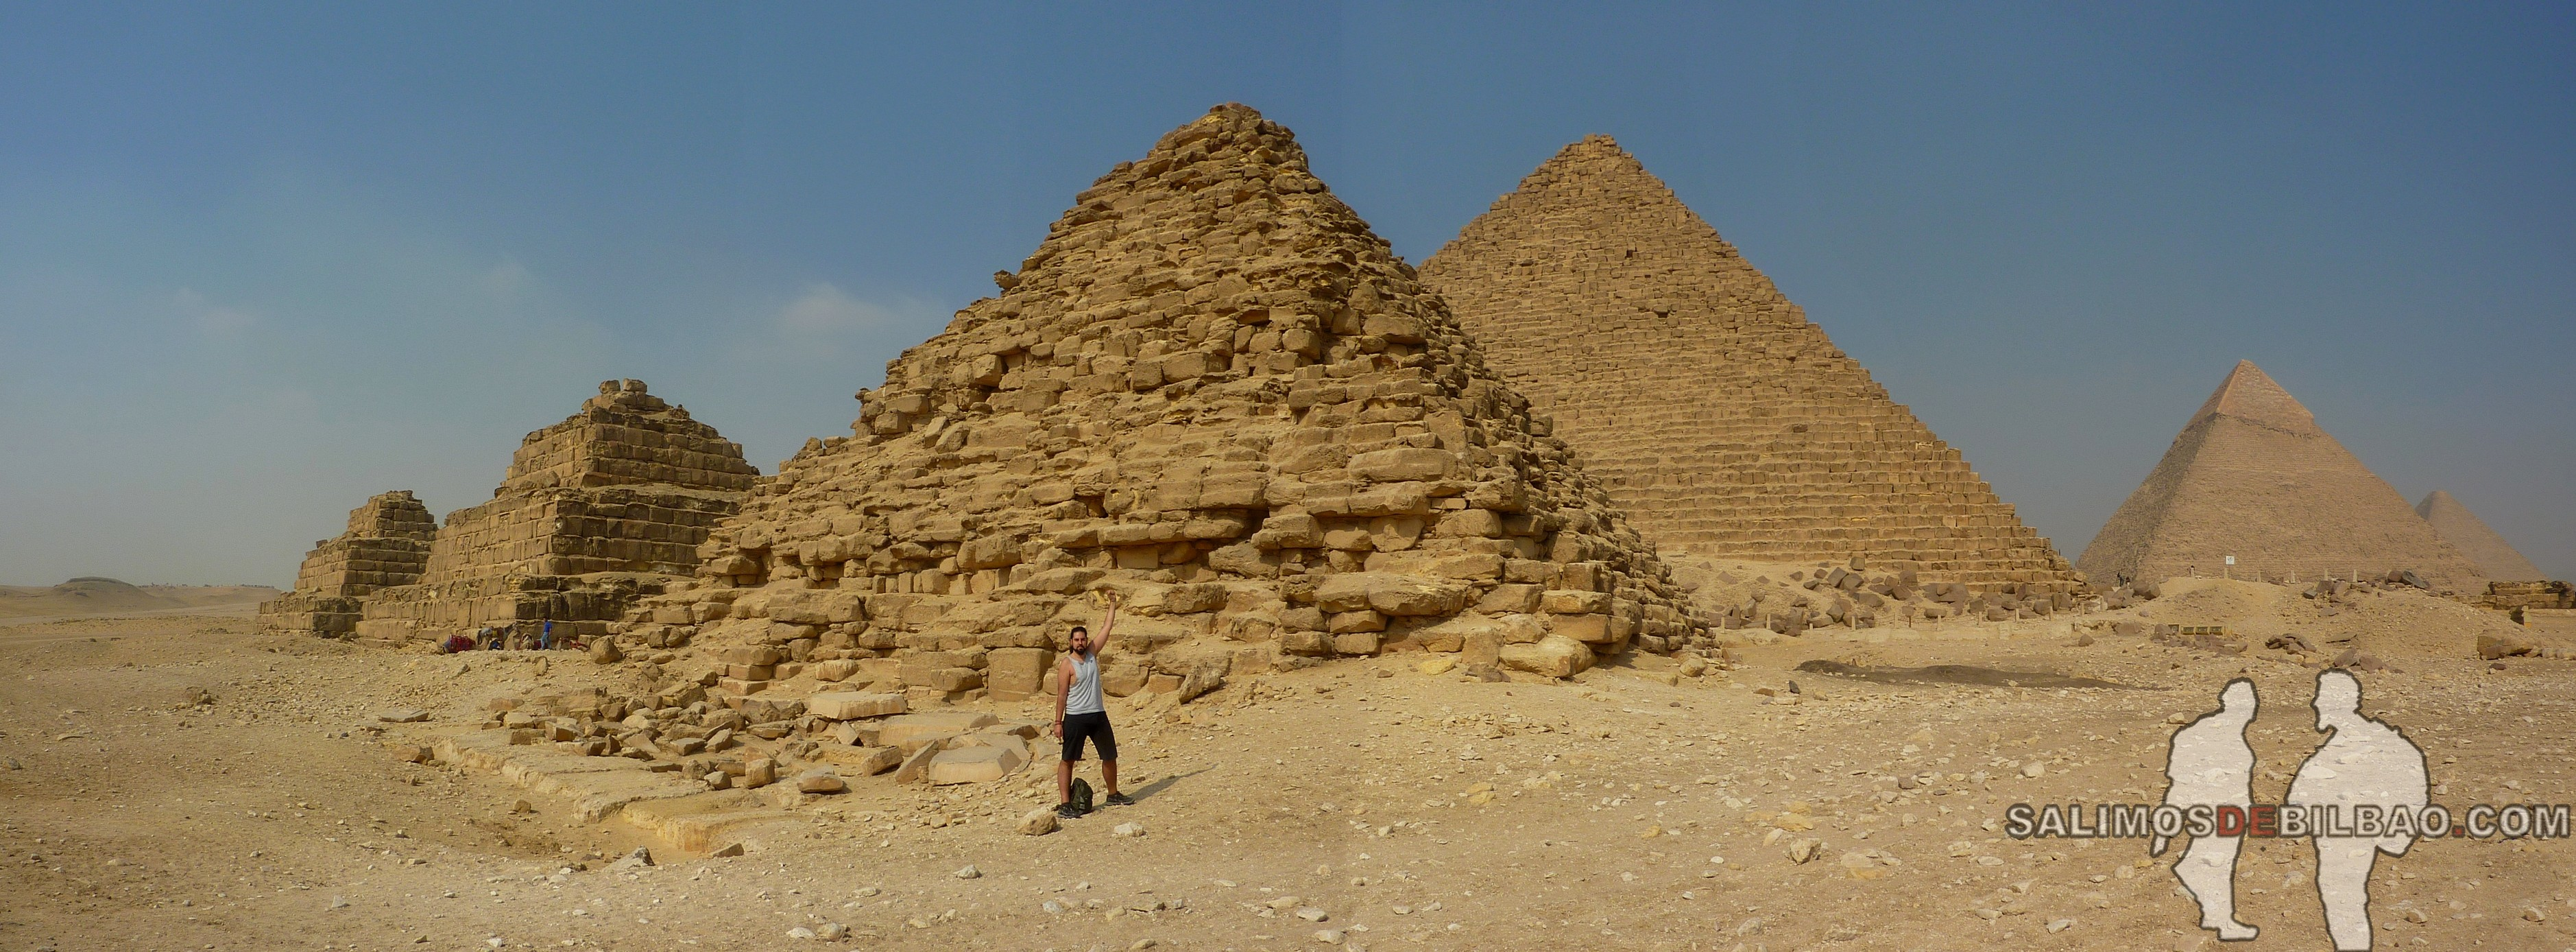 0119. Katz, Pano, Pirámides de Giza